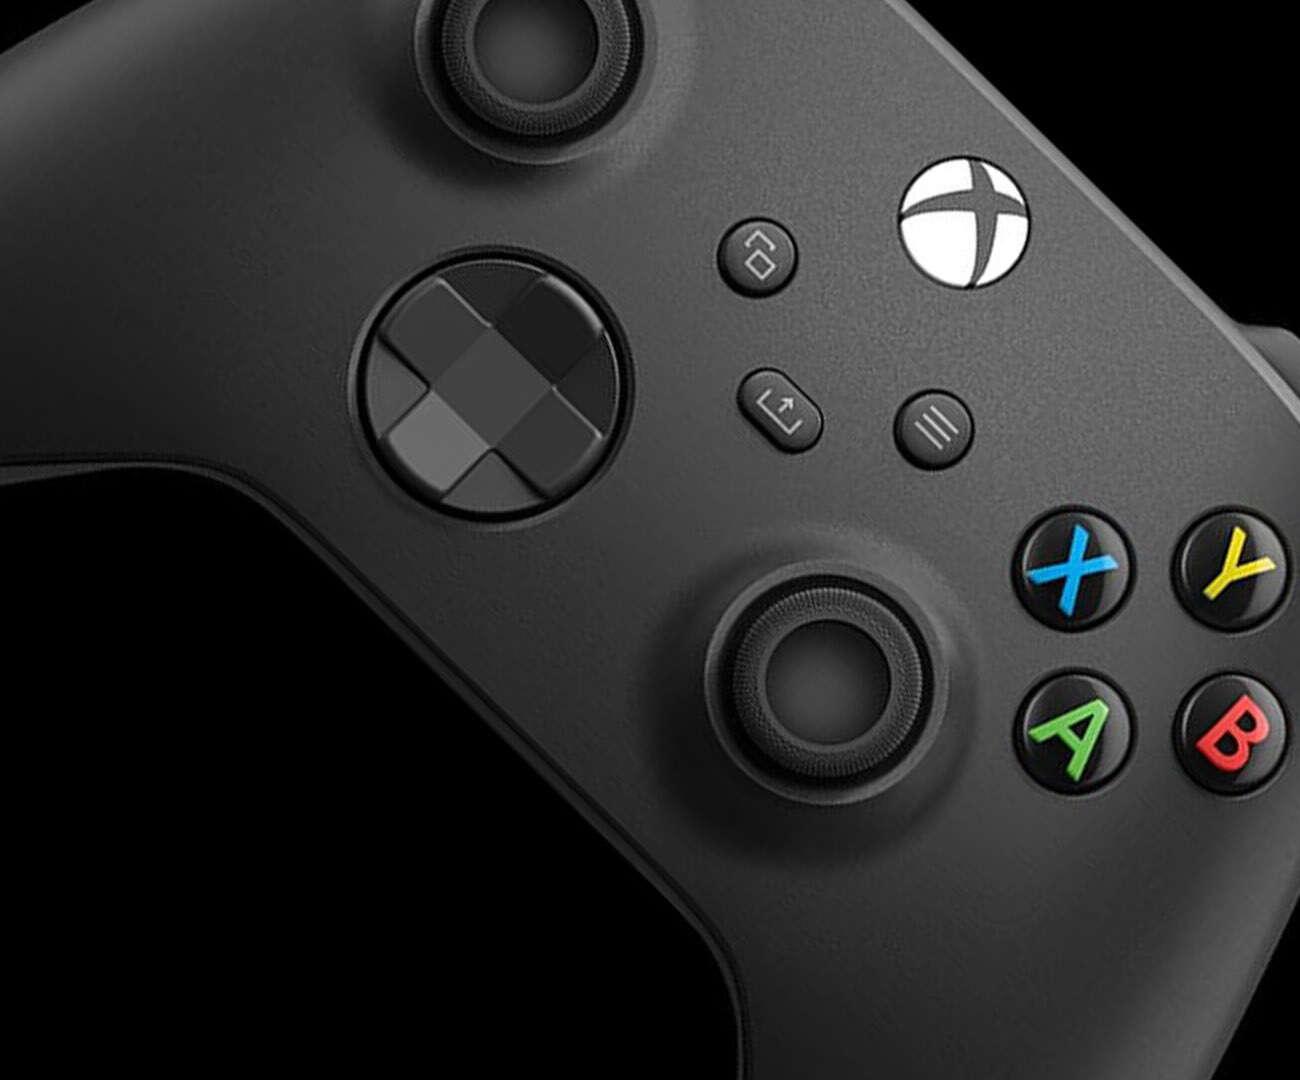 Sta U0142o Si U0119 Kupi U0142em Xbox Series X I Game Pass